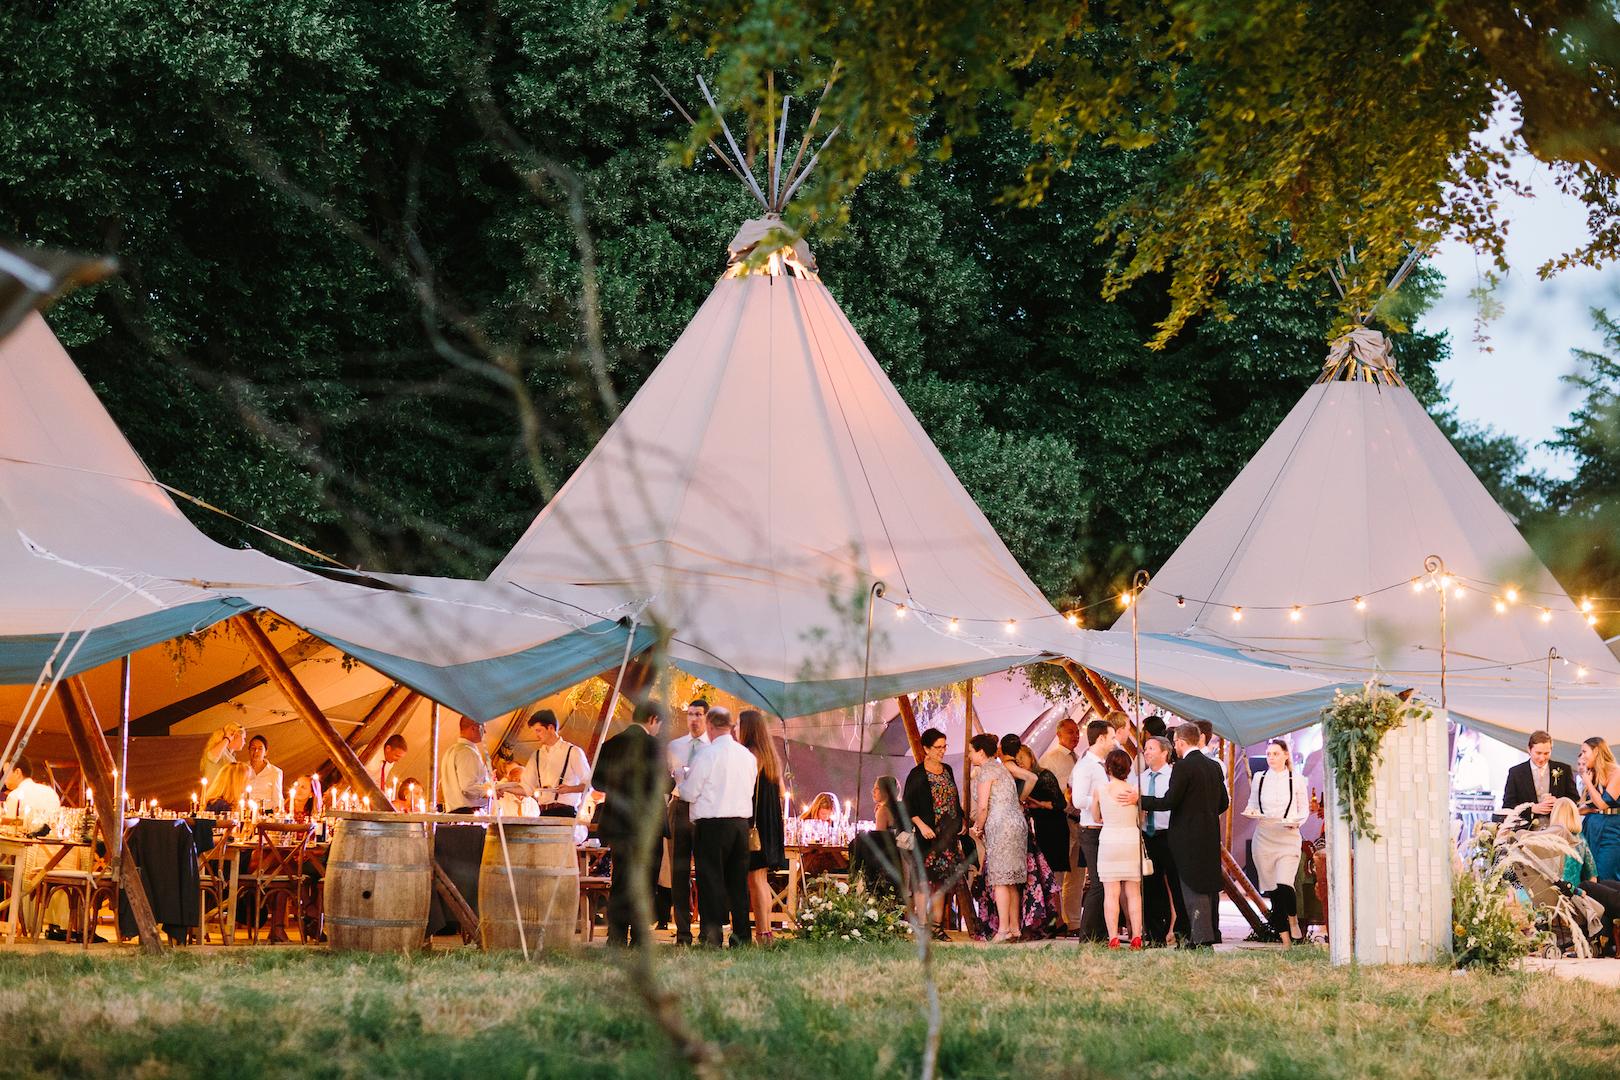 Brennan & Tom's PapaKåta Teepee Wedding by Barker Evans Photography